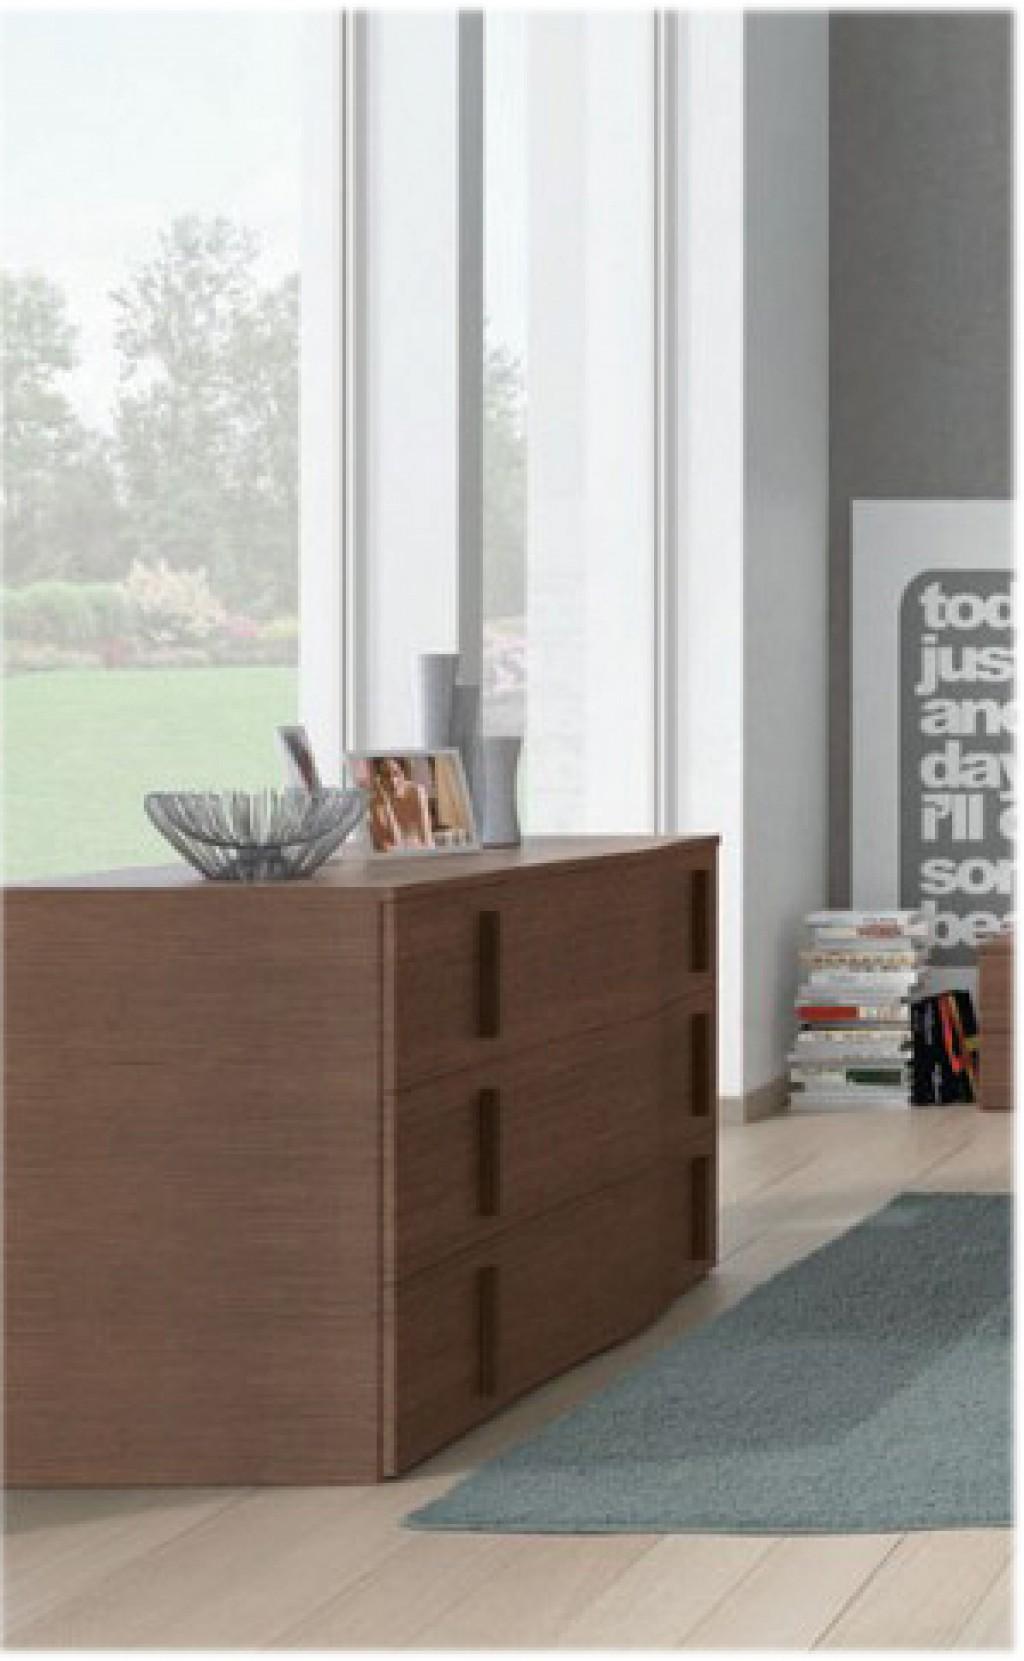 Camera moderna oc m116 cucine mobili di qualit al for Mobili cucine qualita